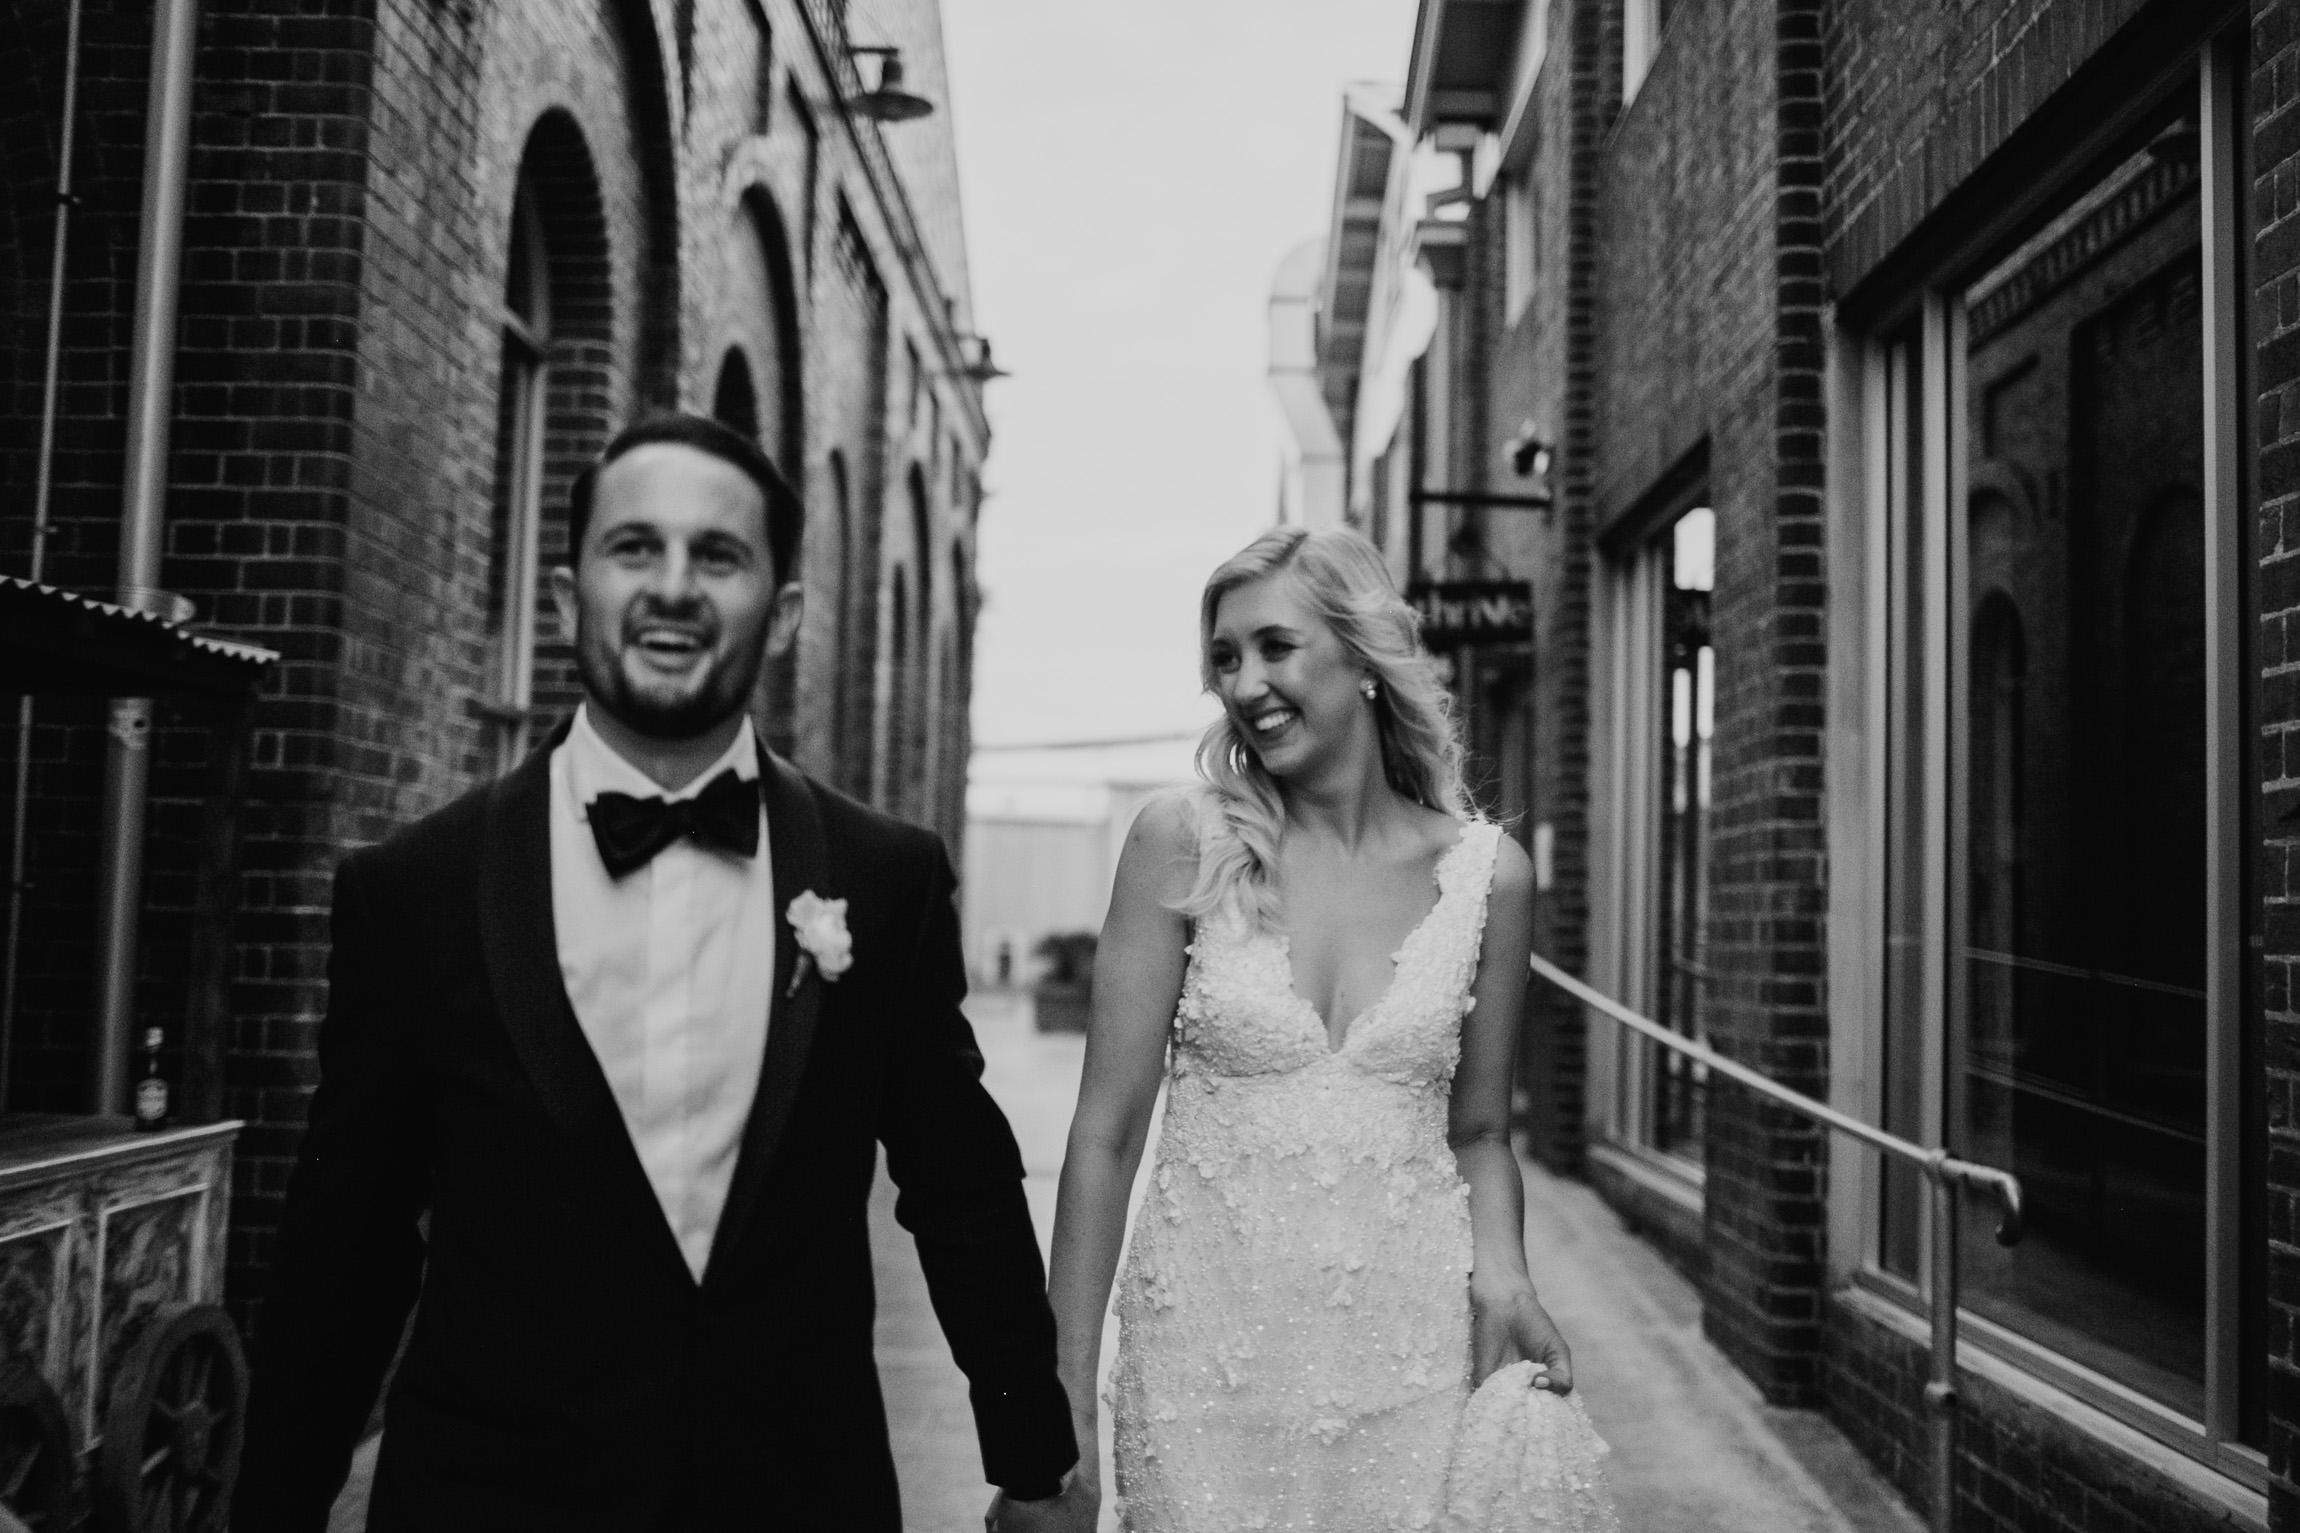 180223_justinaaron_wedding_charlotte_david_h-223.jpg